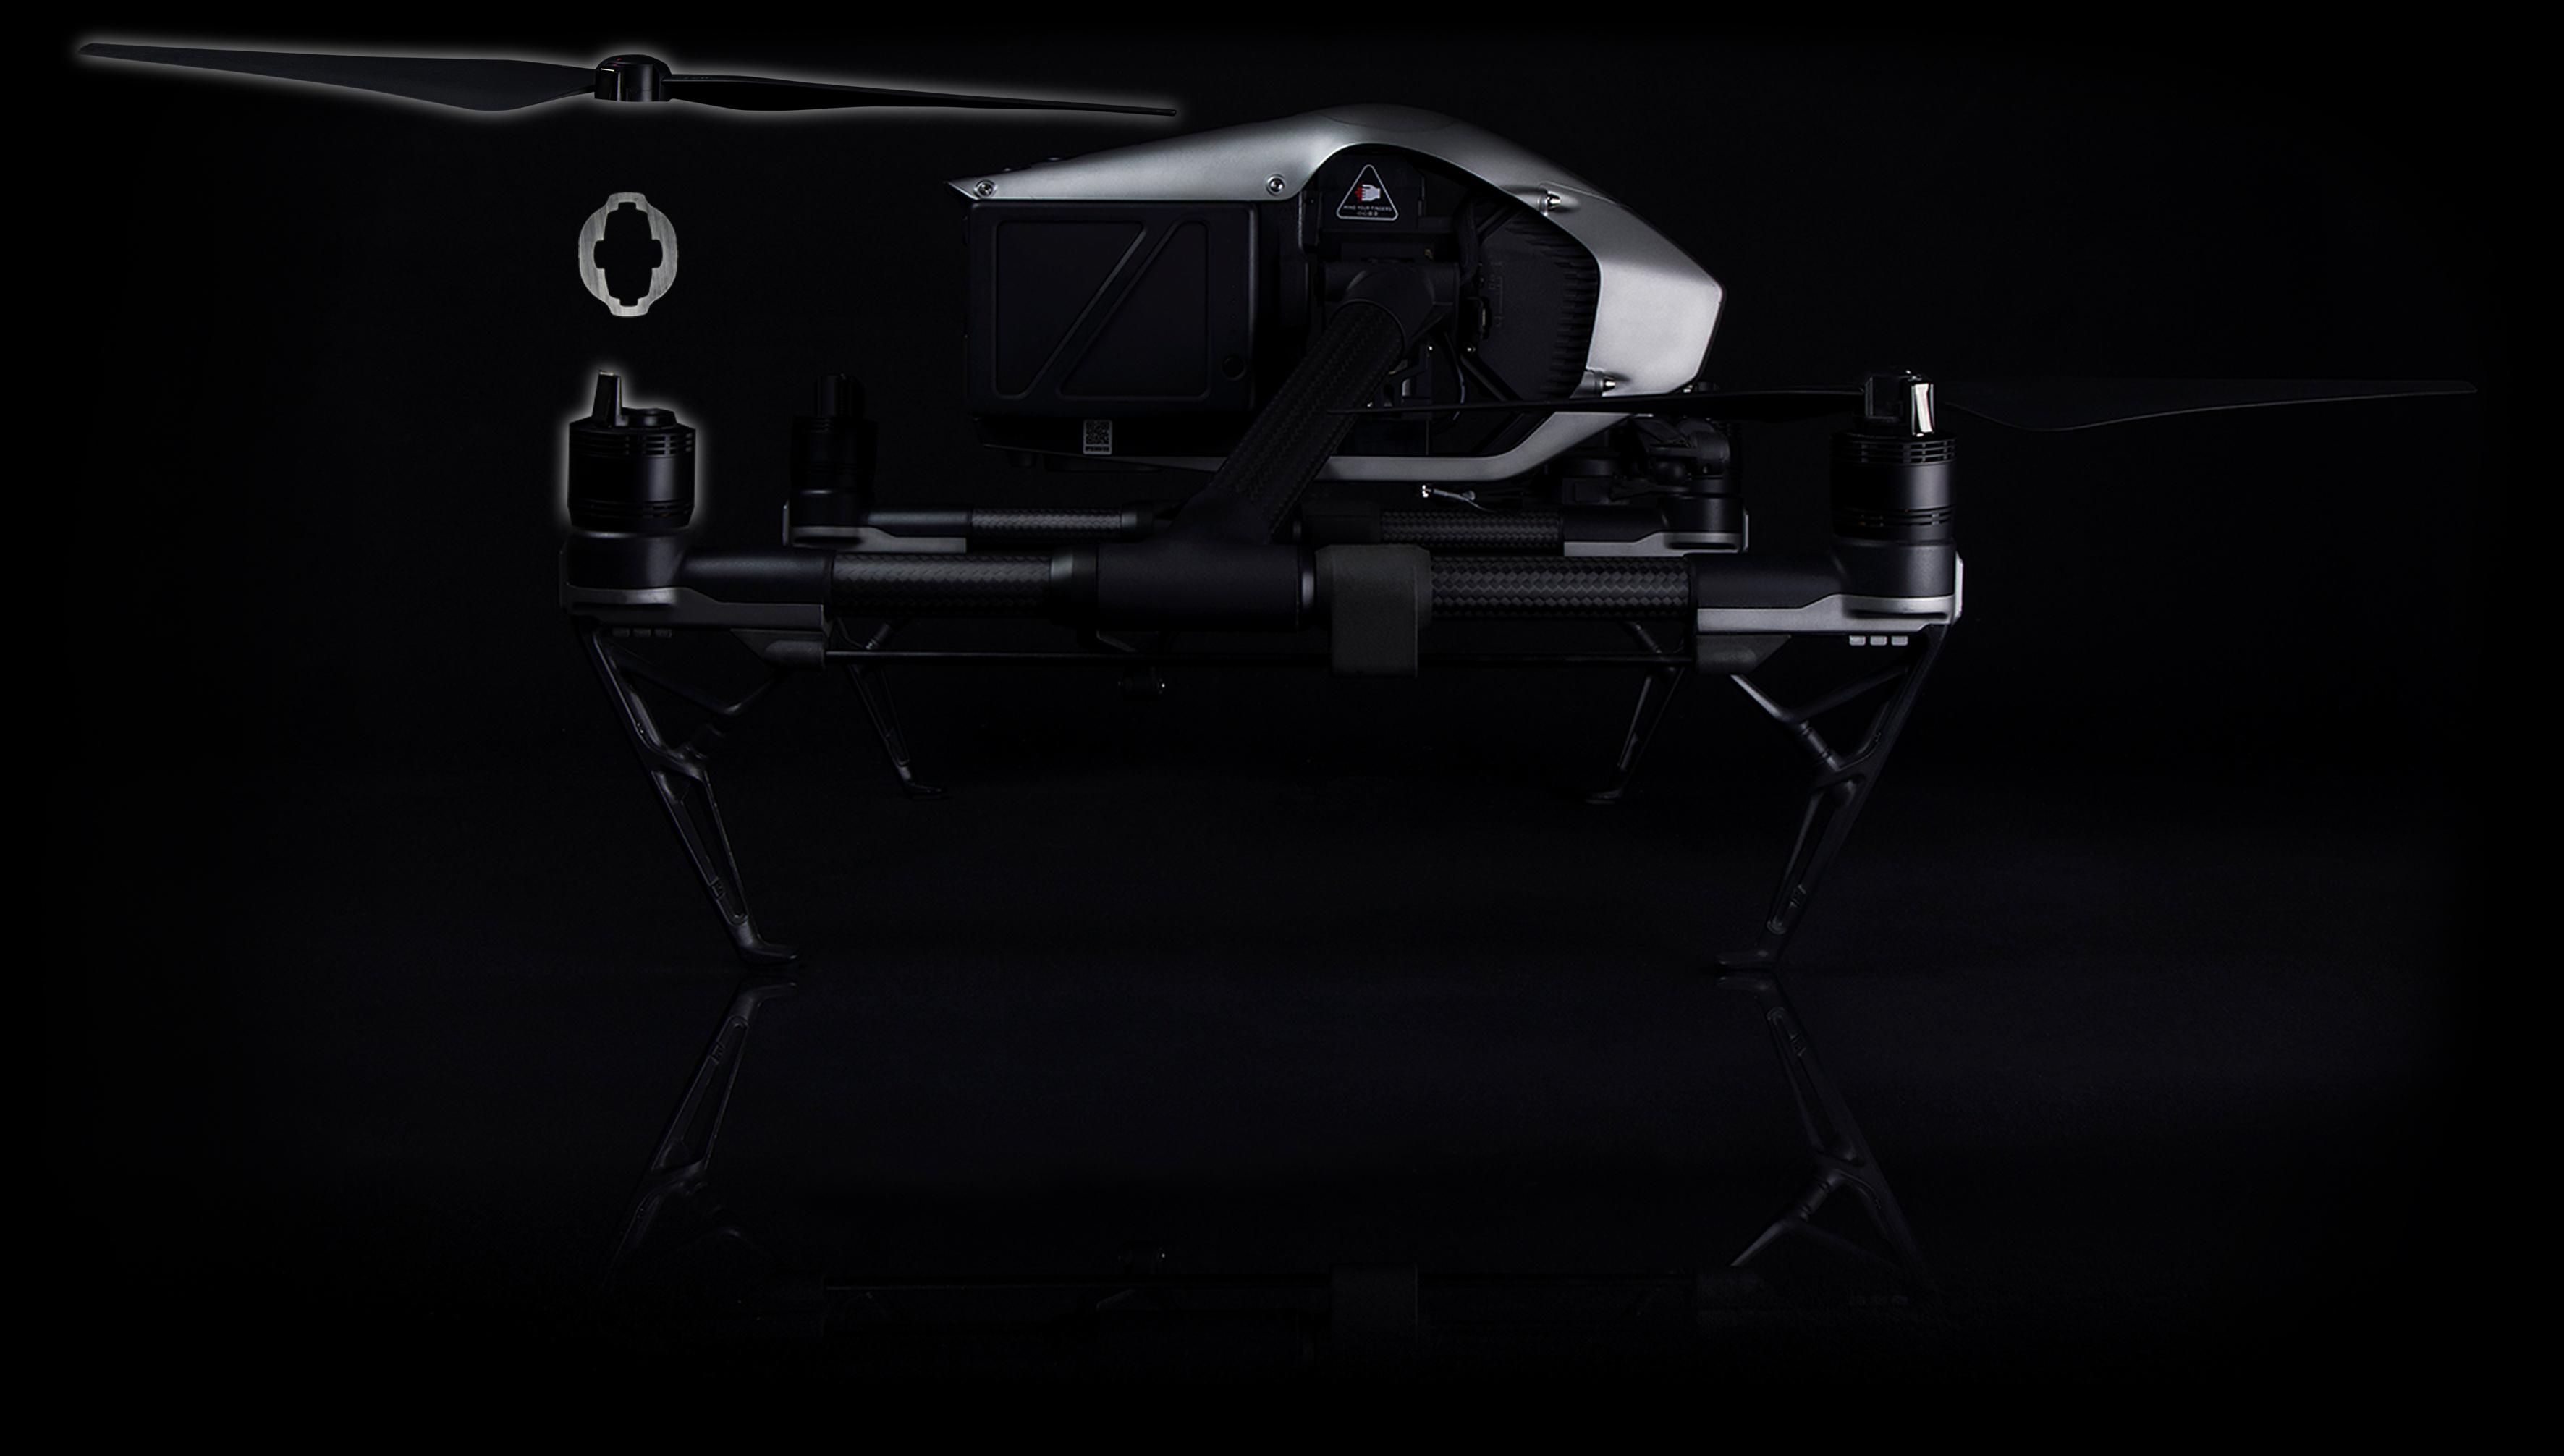 Propellers-image